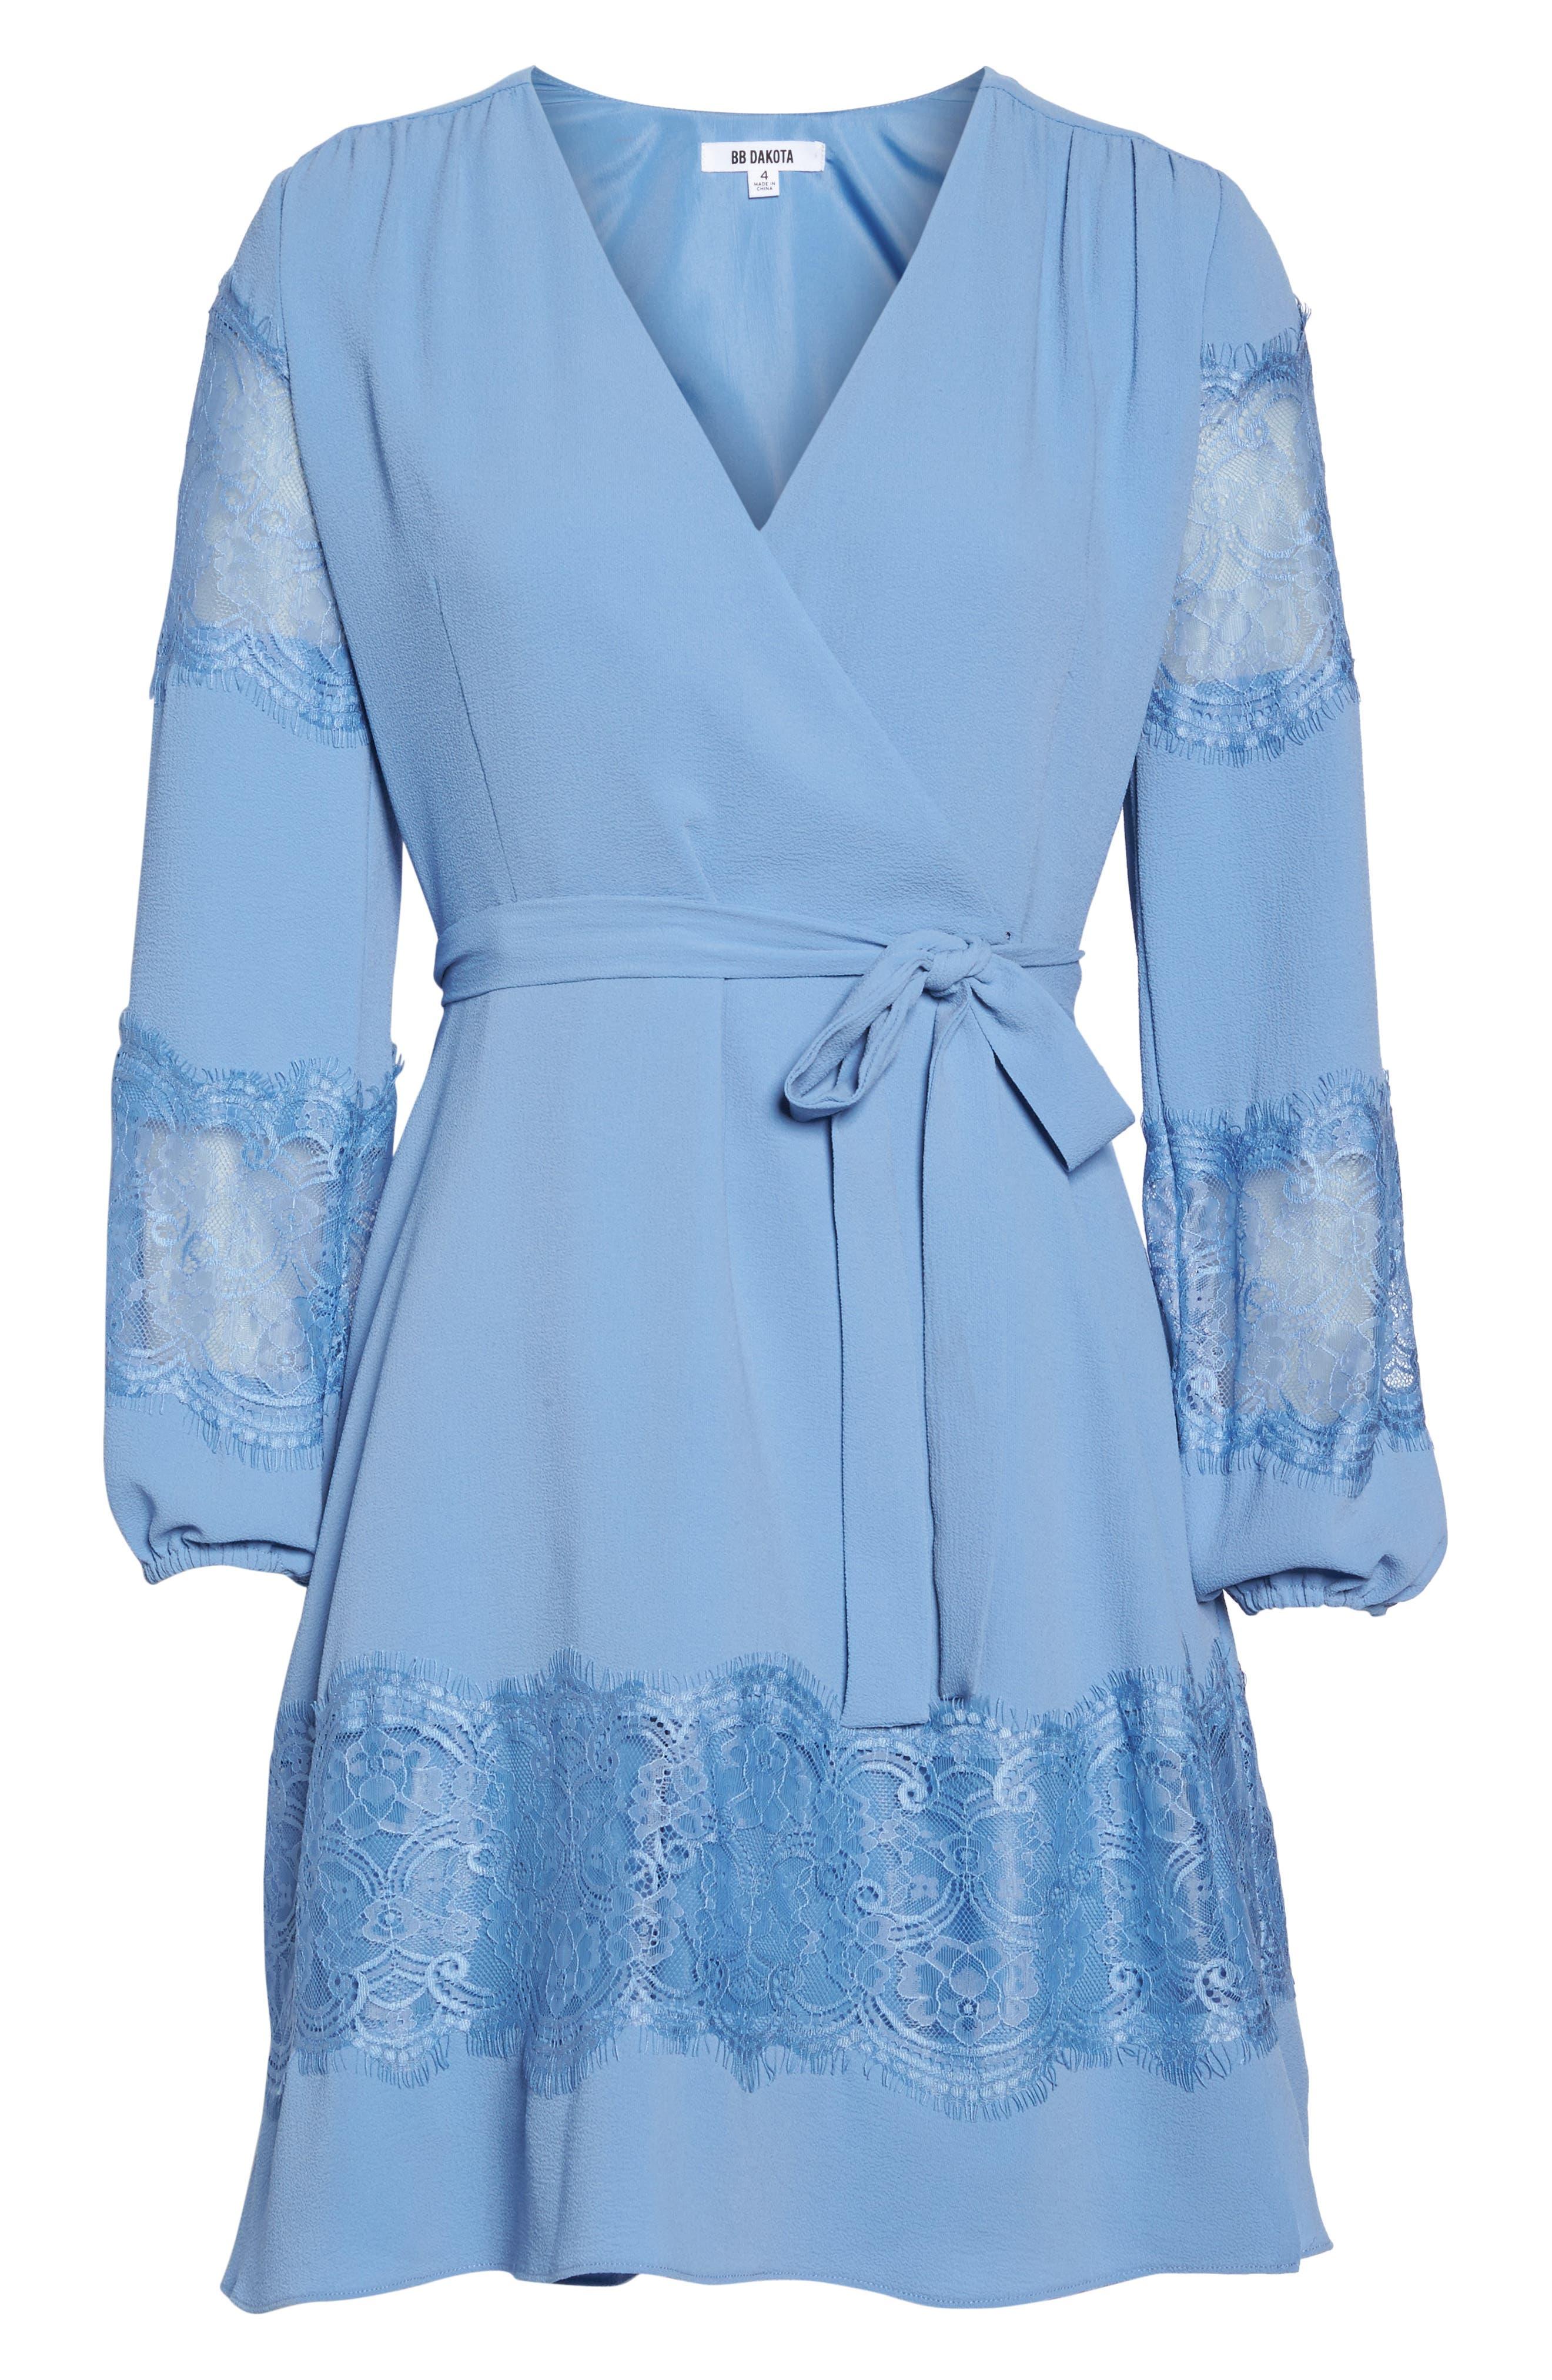 Lauryl Wrap Dress,                             Alternate thumbnail 6, color,                             450